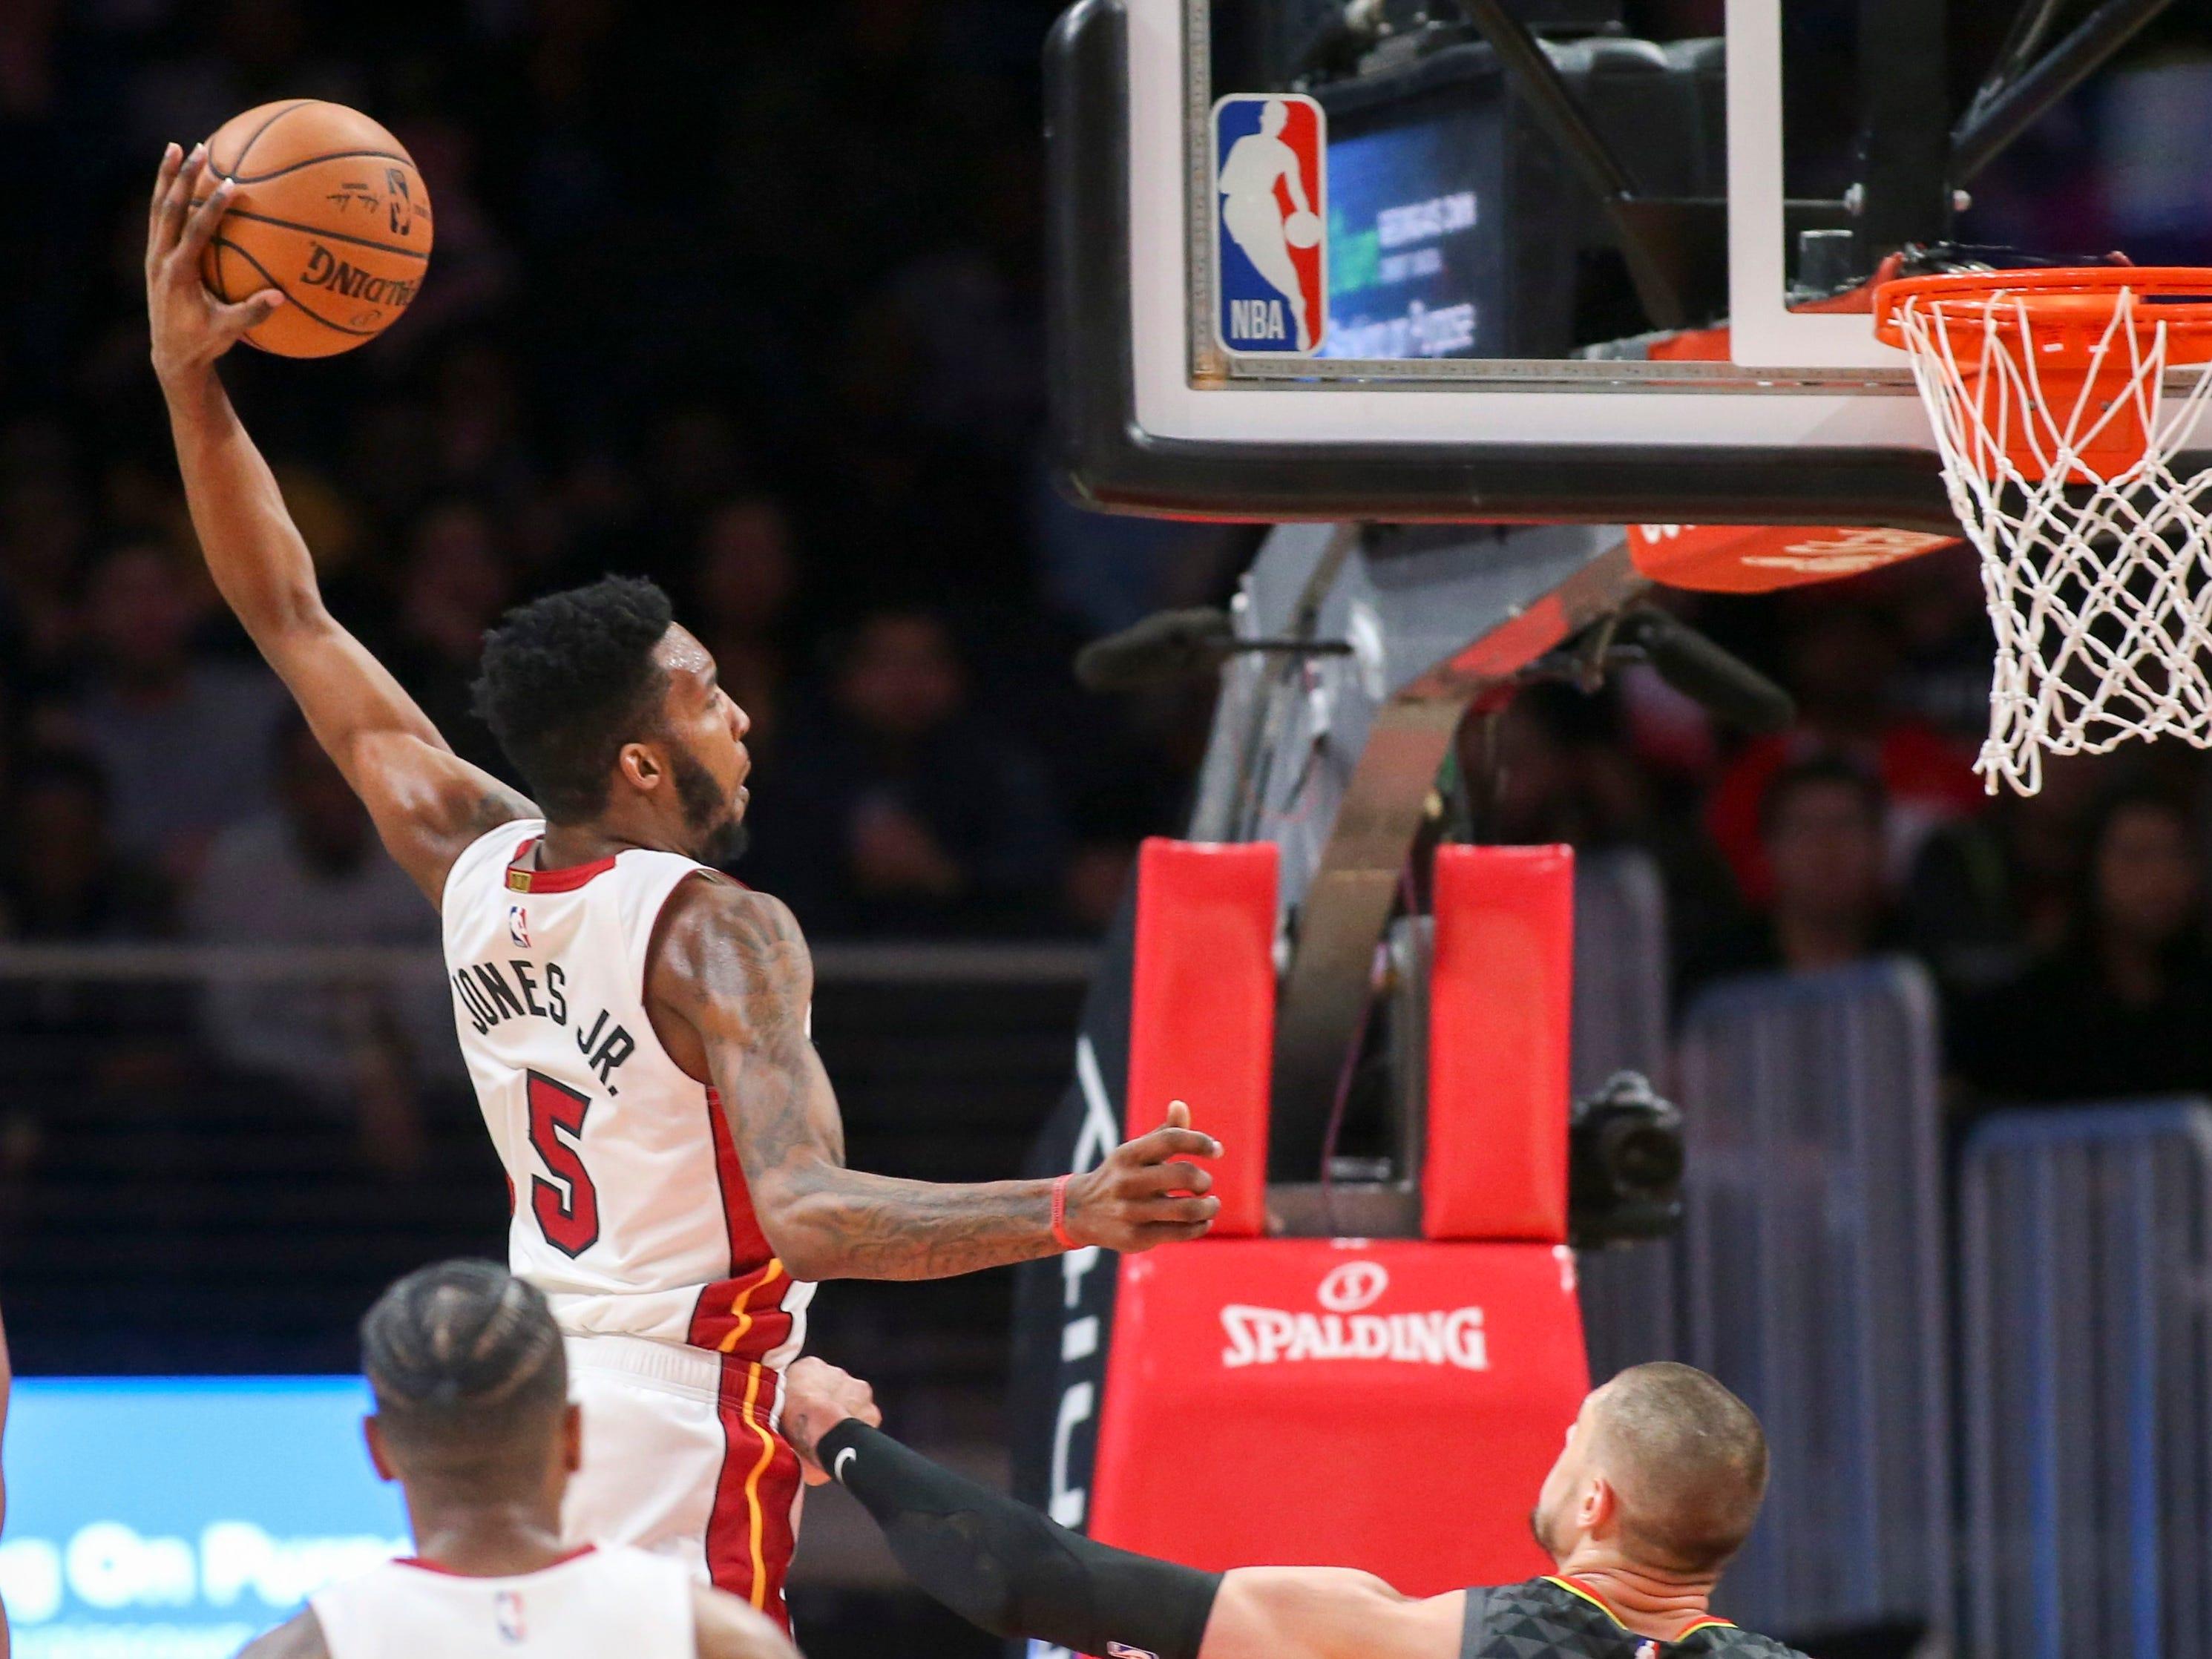 Nov. 3: Heat forward Derrick Jones Jr. (5) takes flight for a one-handed flush against the Hawks in Atlanta.